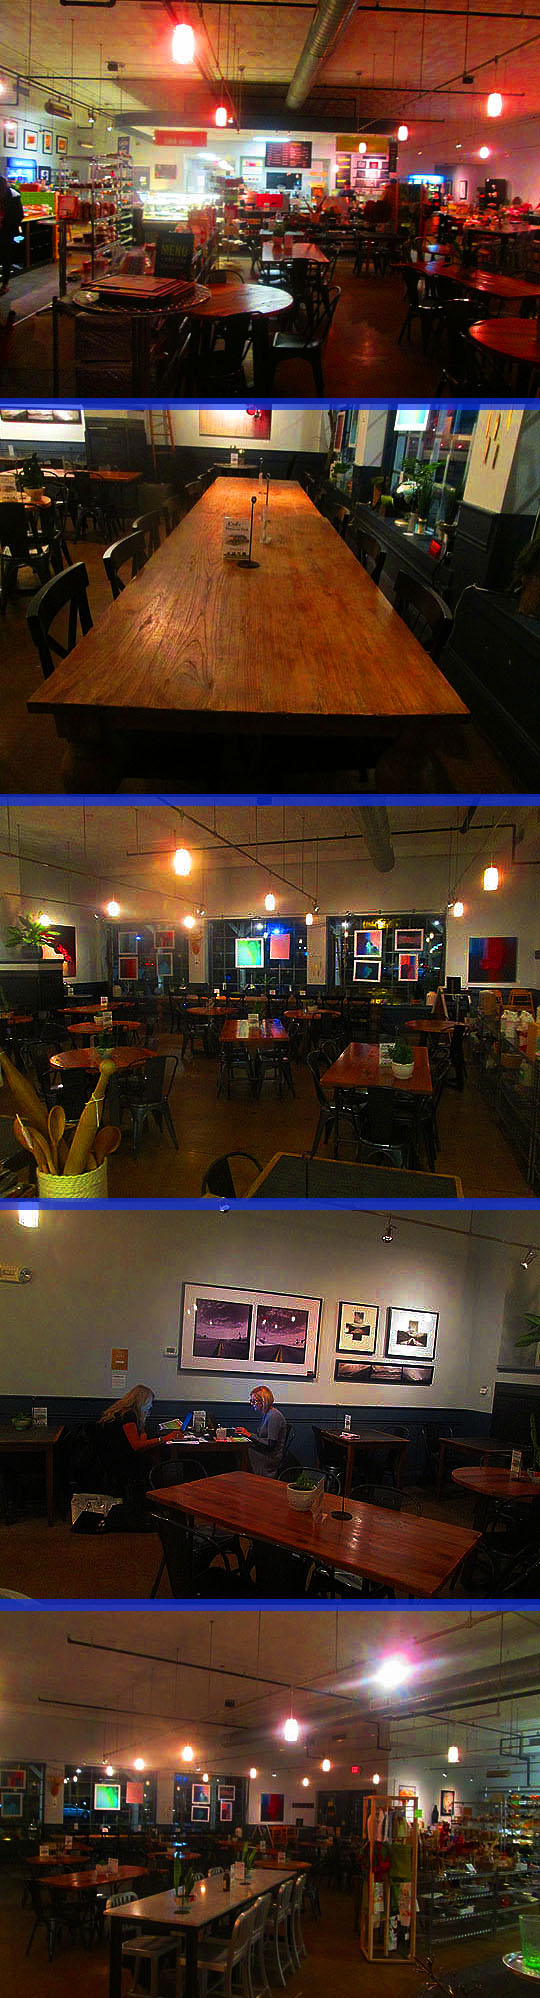 4. diningroom_jan17-18.jpg